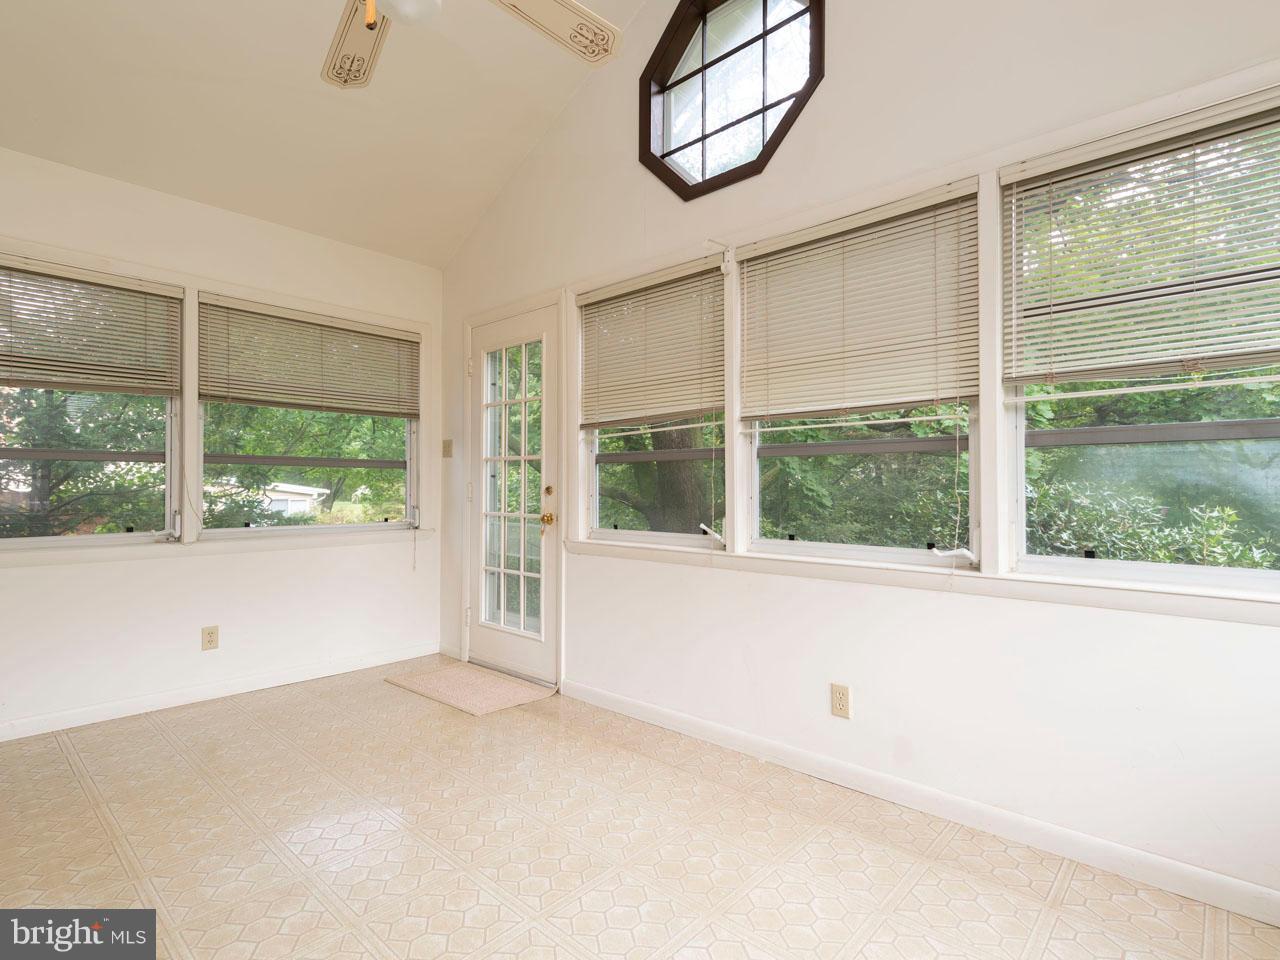 VAFX300106-301103779978-2021-09-05-14-14-30  |   | Alexandria Delaware Real Estate For Sale | MLS# Vafx300106  - Best of Northern Virginia